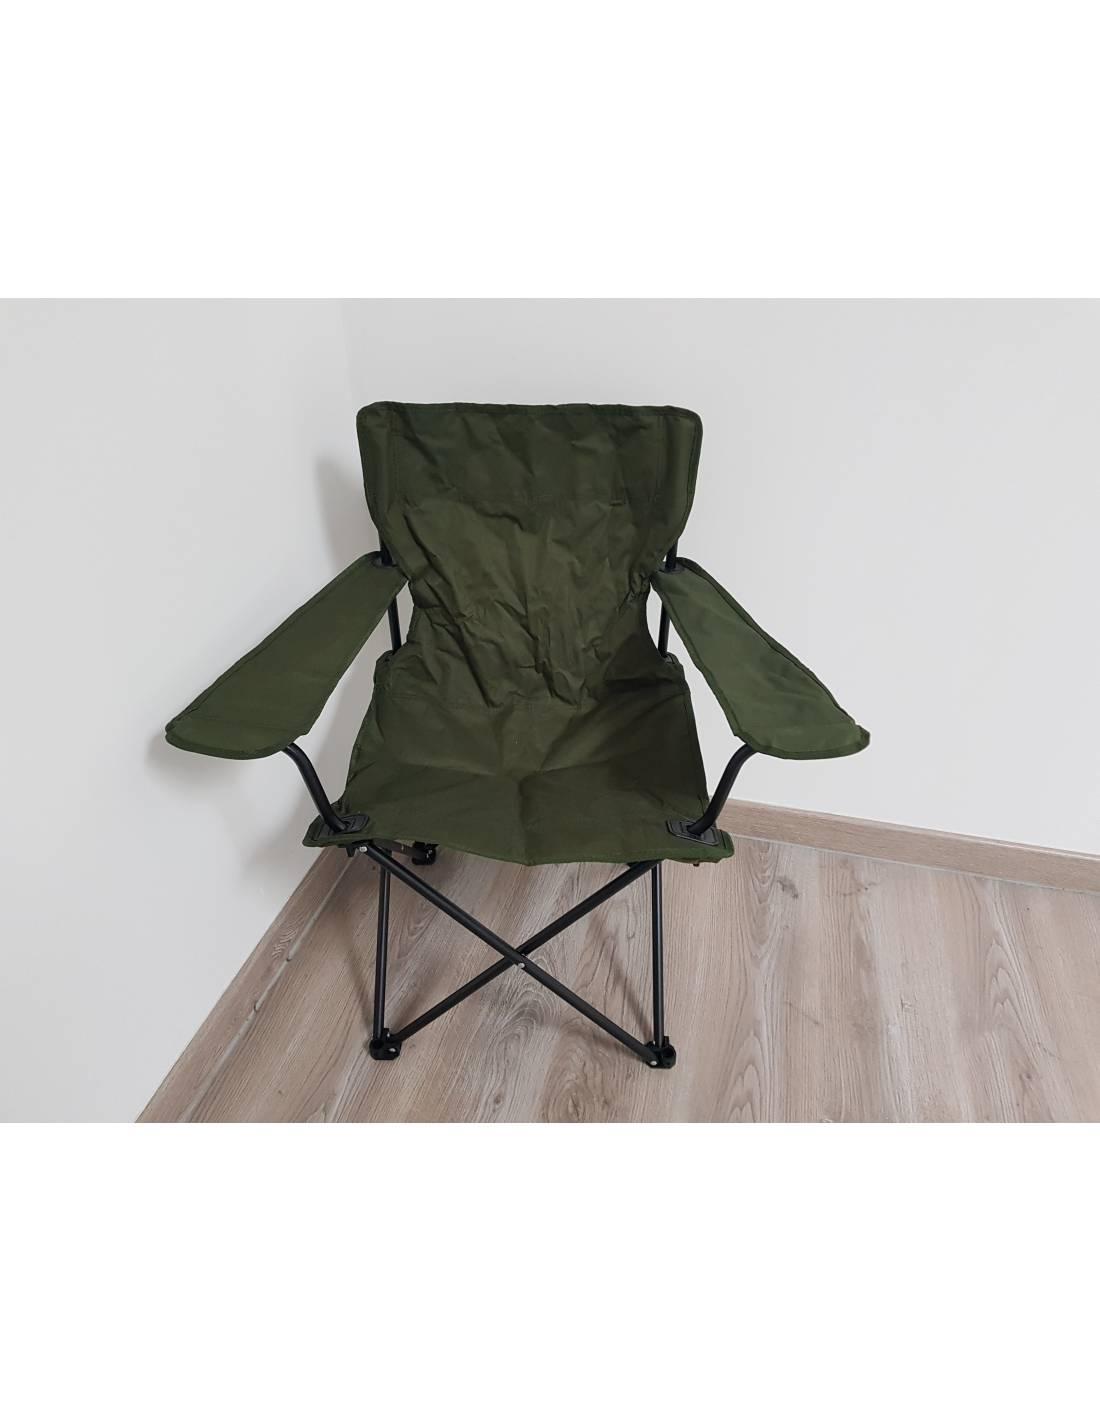 chaise pliante arm e anglaise originale. Black Bedroom Furniture Sets. Home Design Ideas